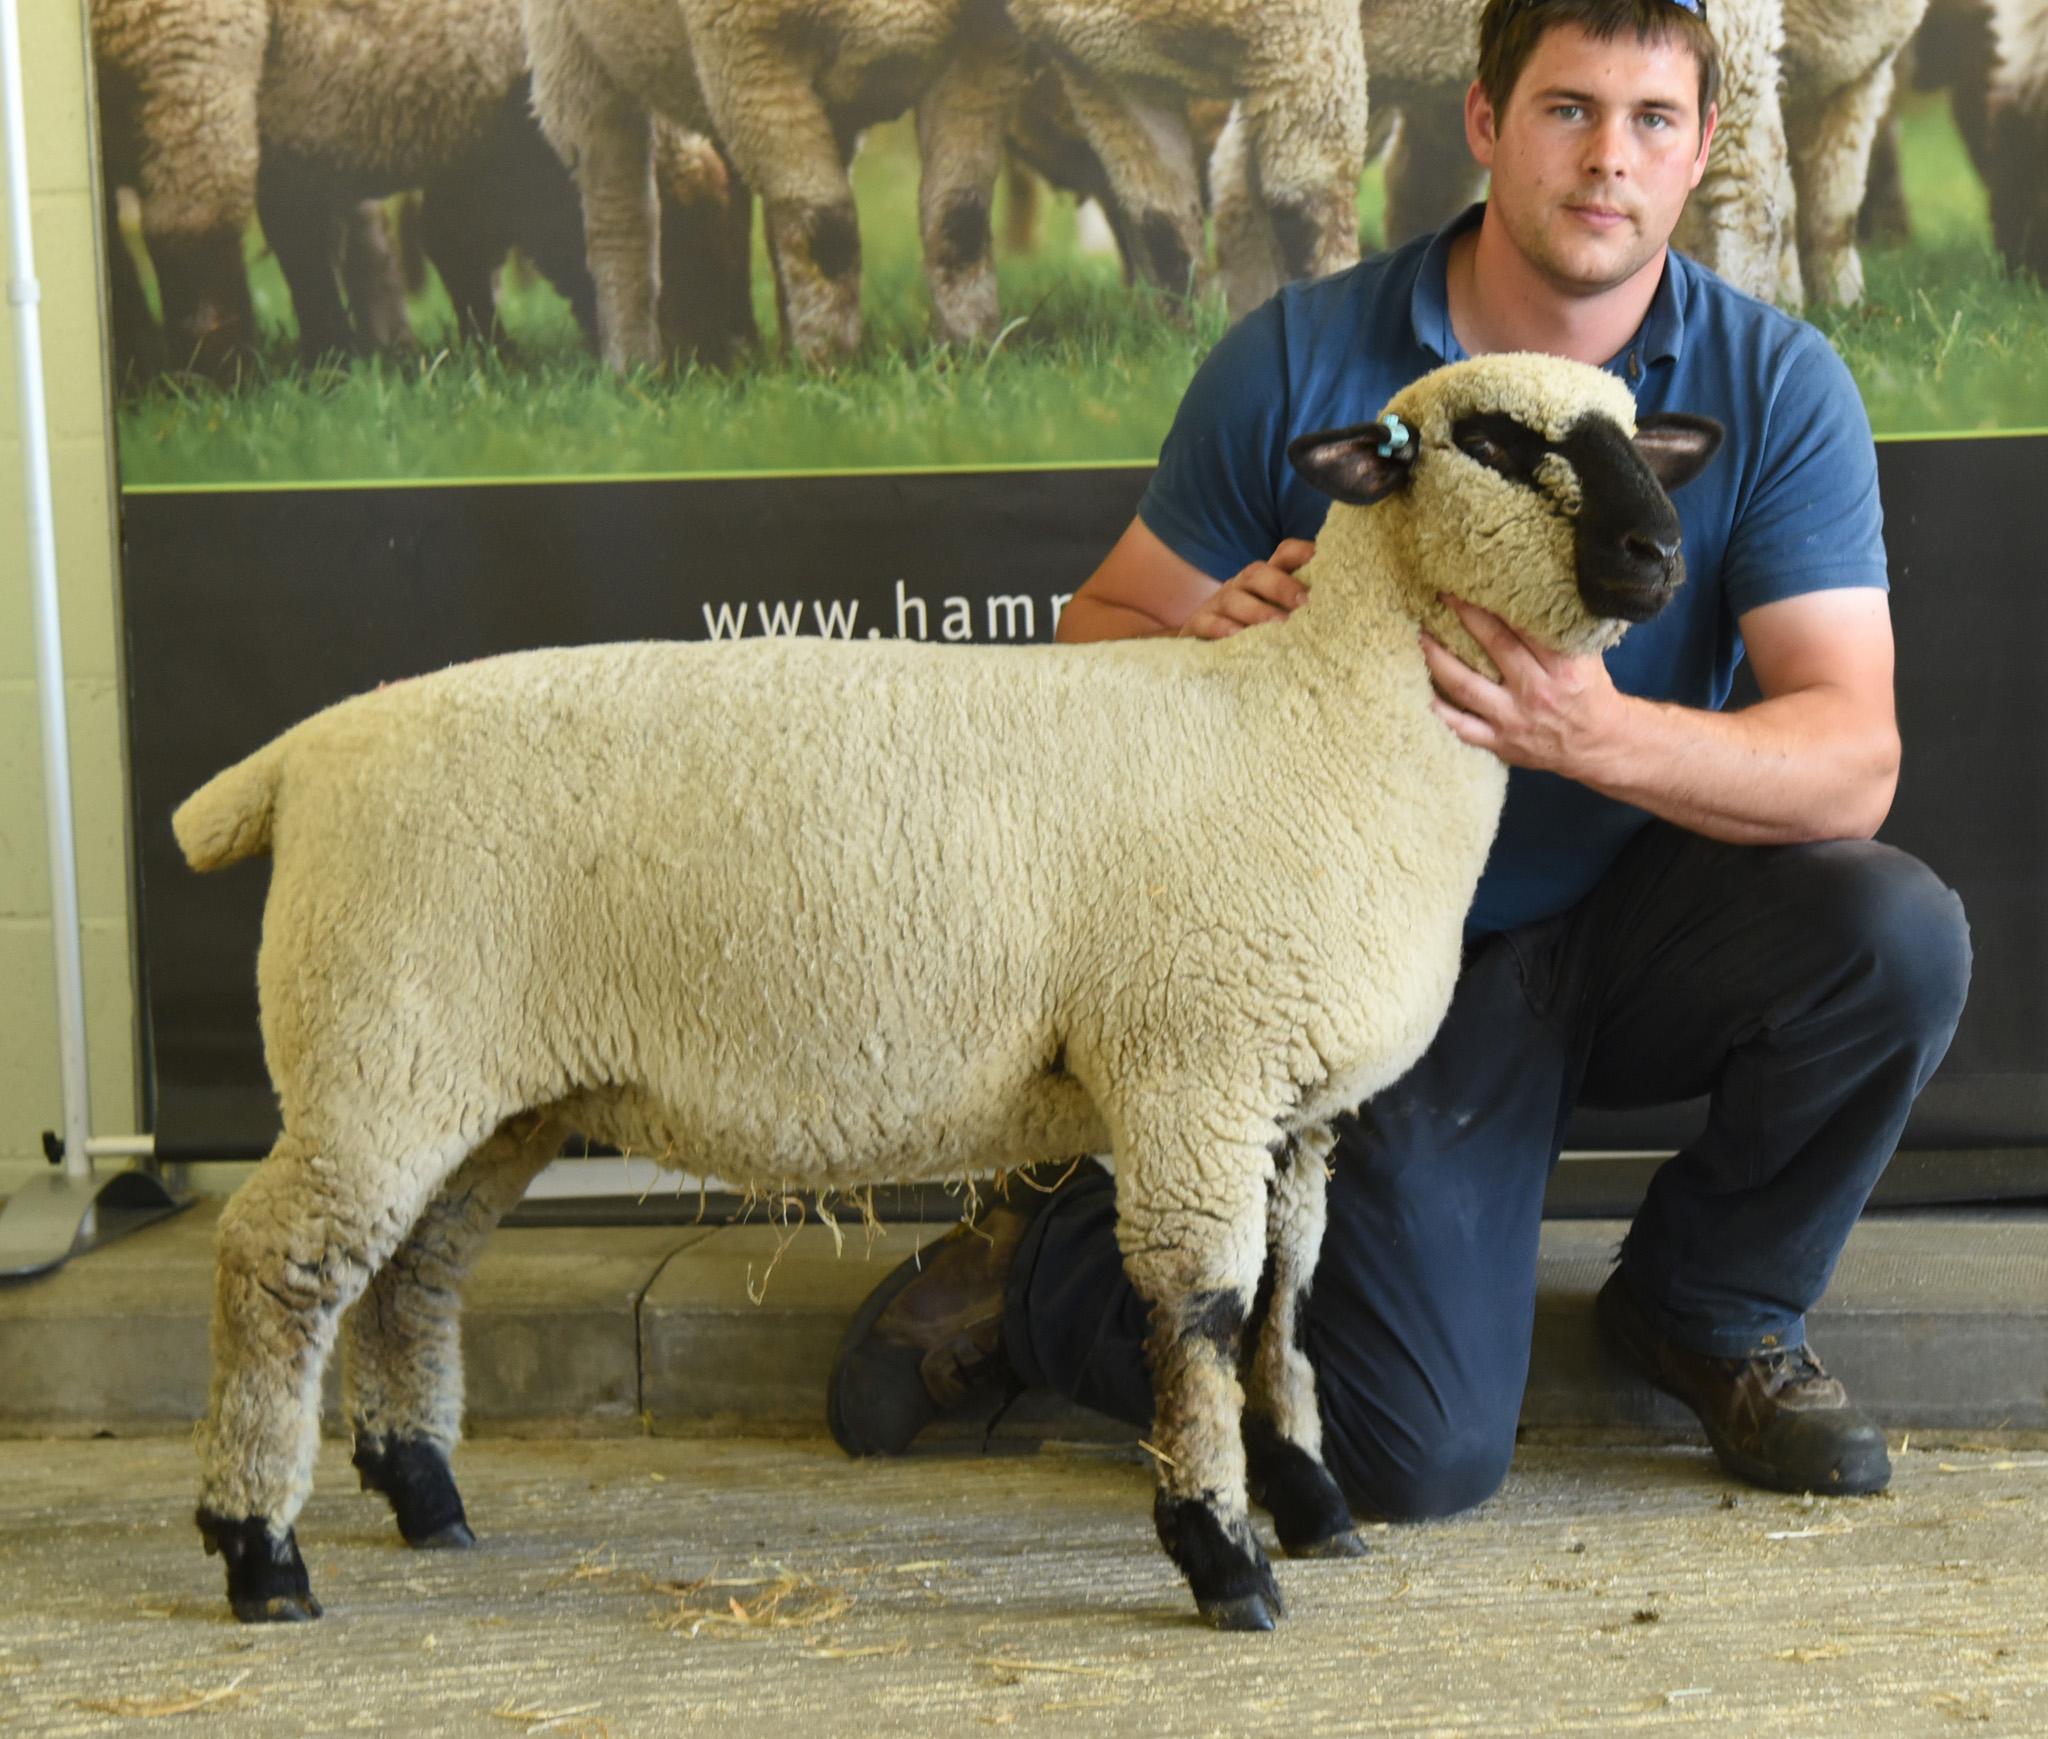 Best selling ewe lamb, from Austyn Chapman and Nikki Wadkins, EPPLEBY FLOCK